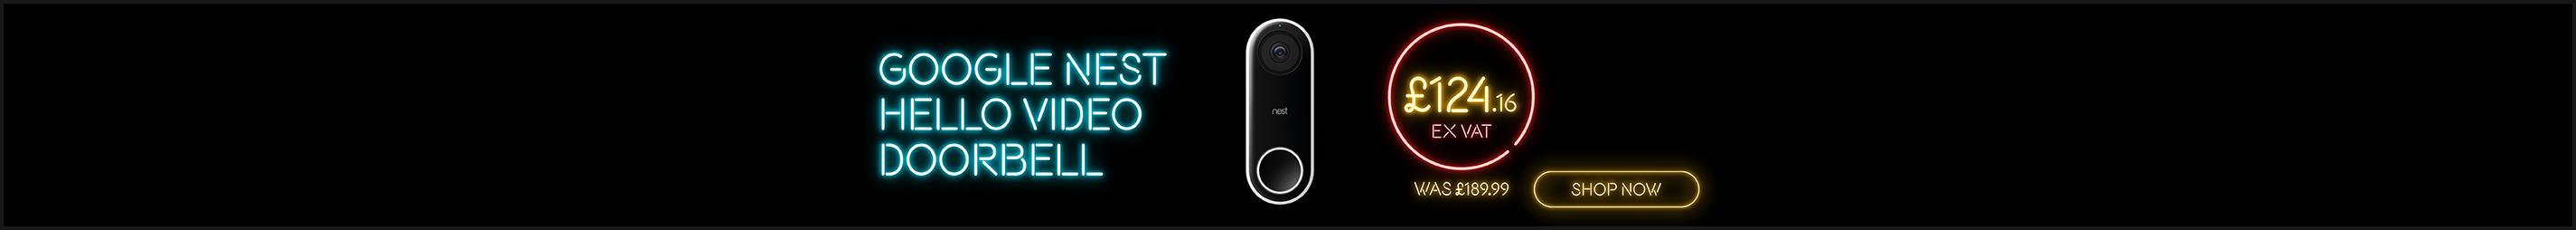 Save on Google Nest Doorbell